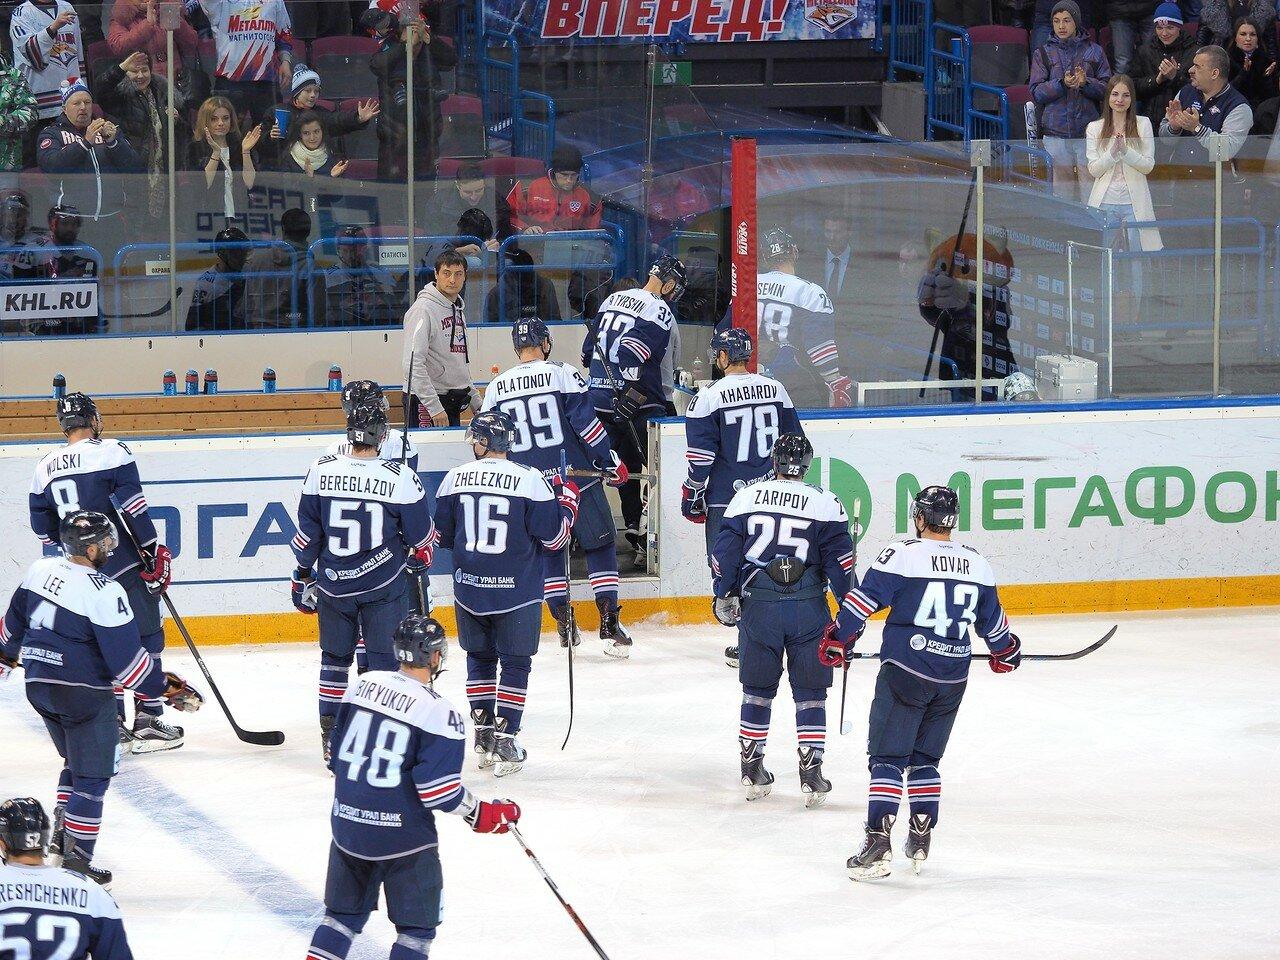 150Плей-офф 2016 Восток Финал Металлург - Салават Юлаев 23.03.2016